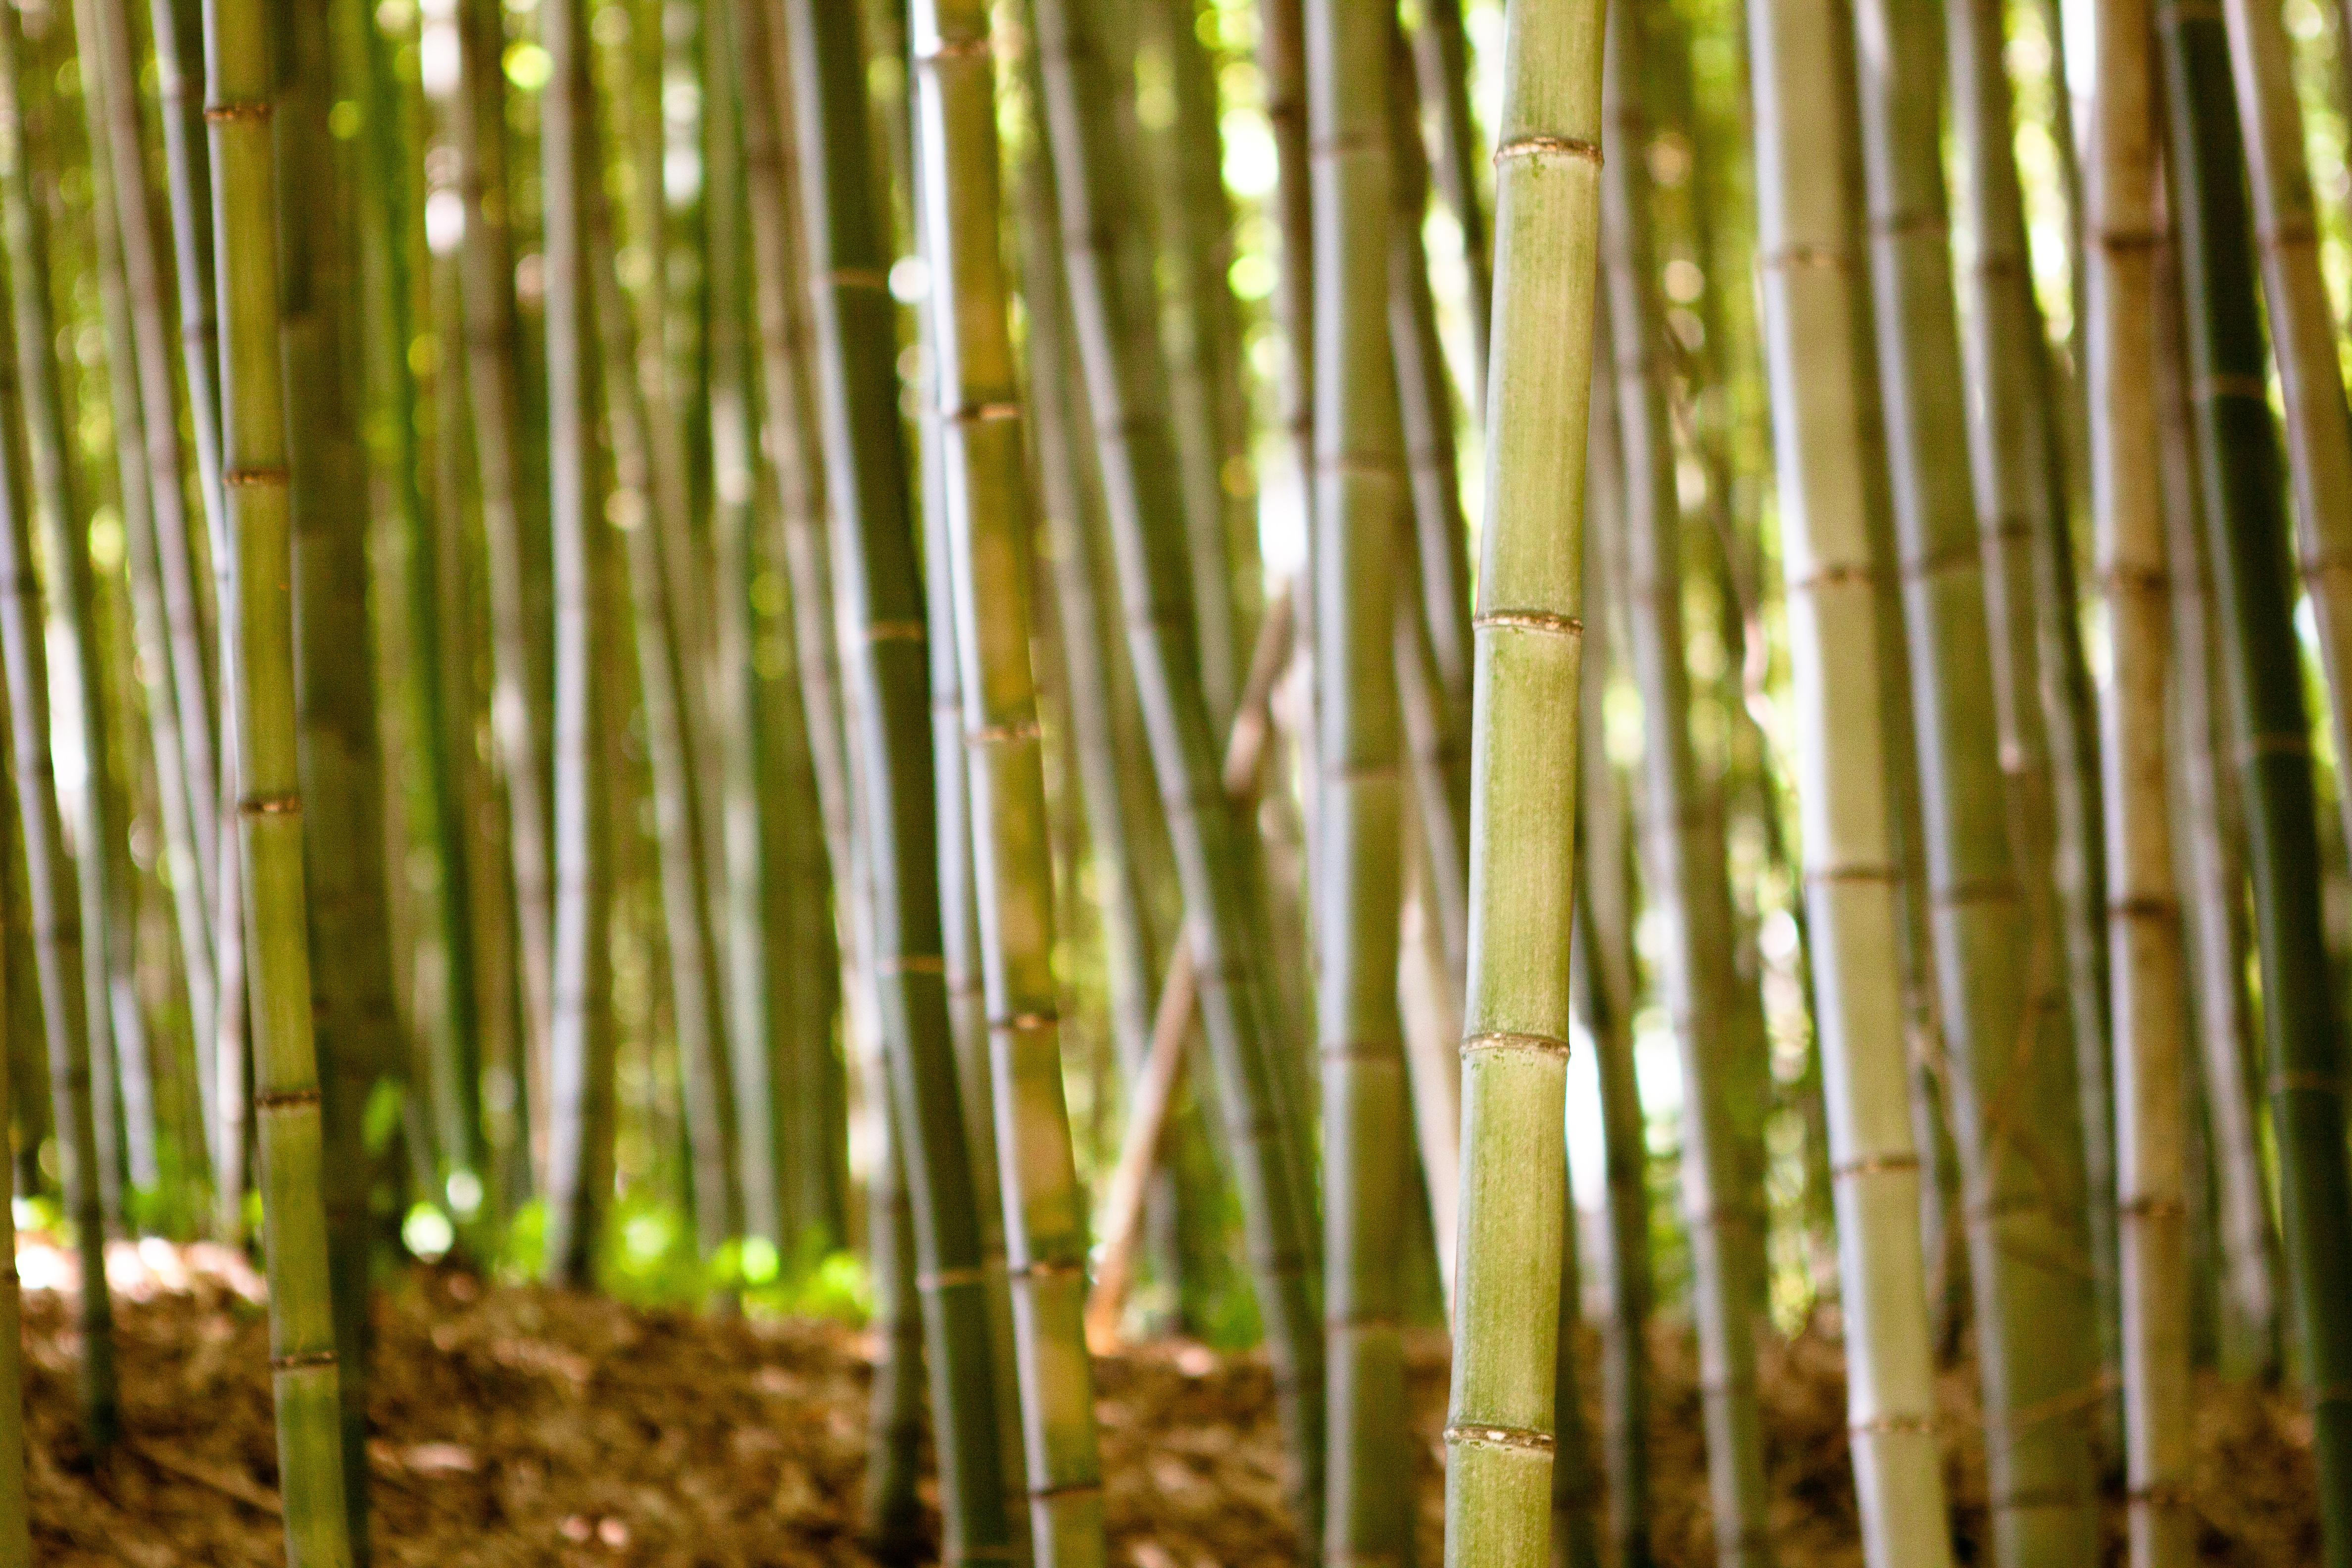 Juknokwon Bamboo Garden (죽녹원), Damyang (담양), South Korea